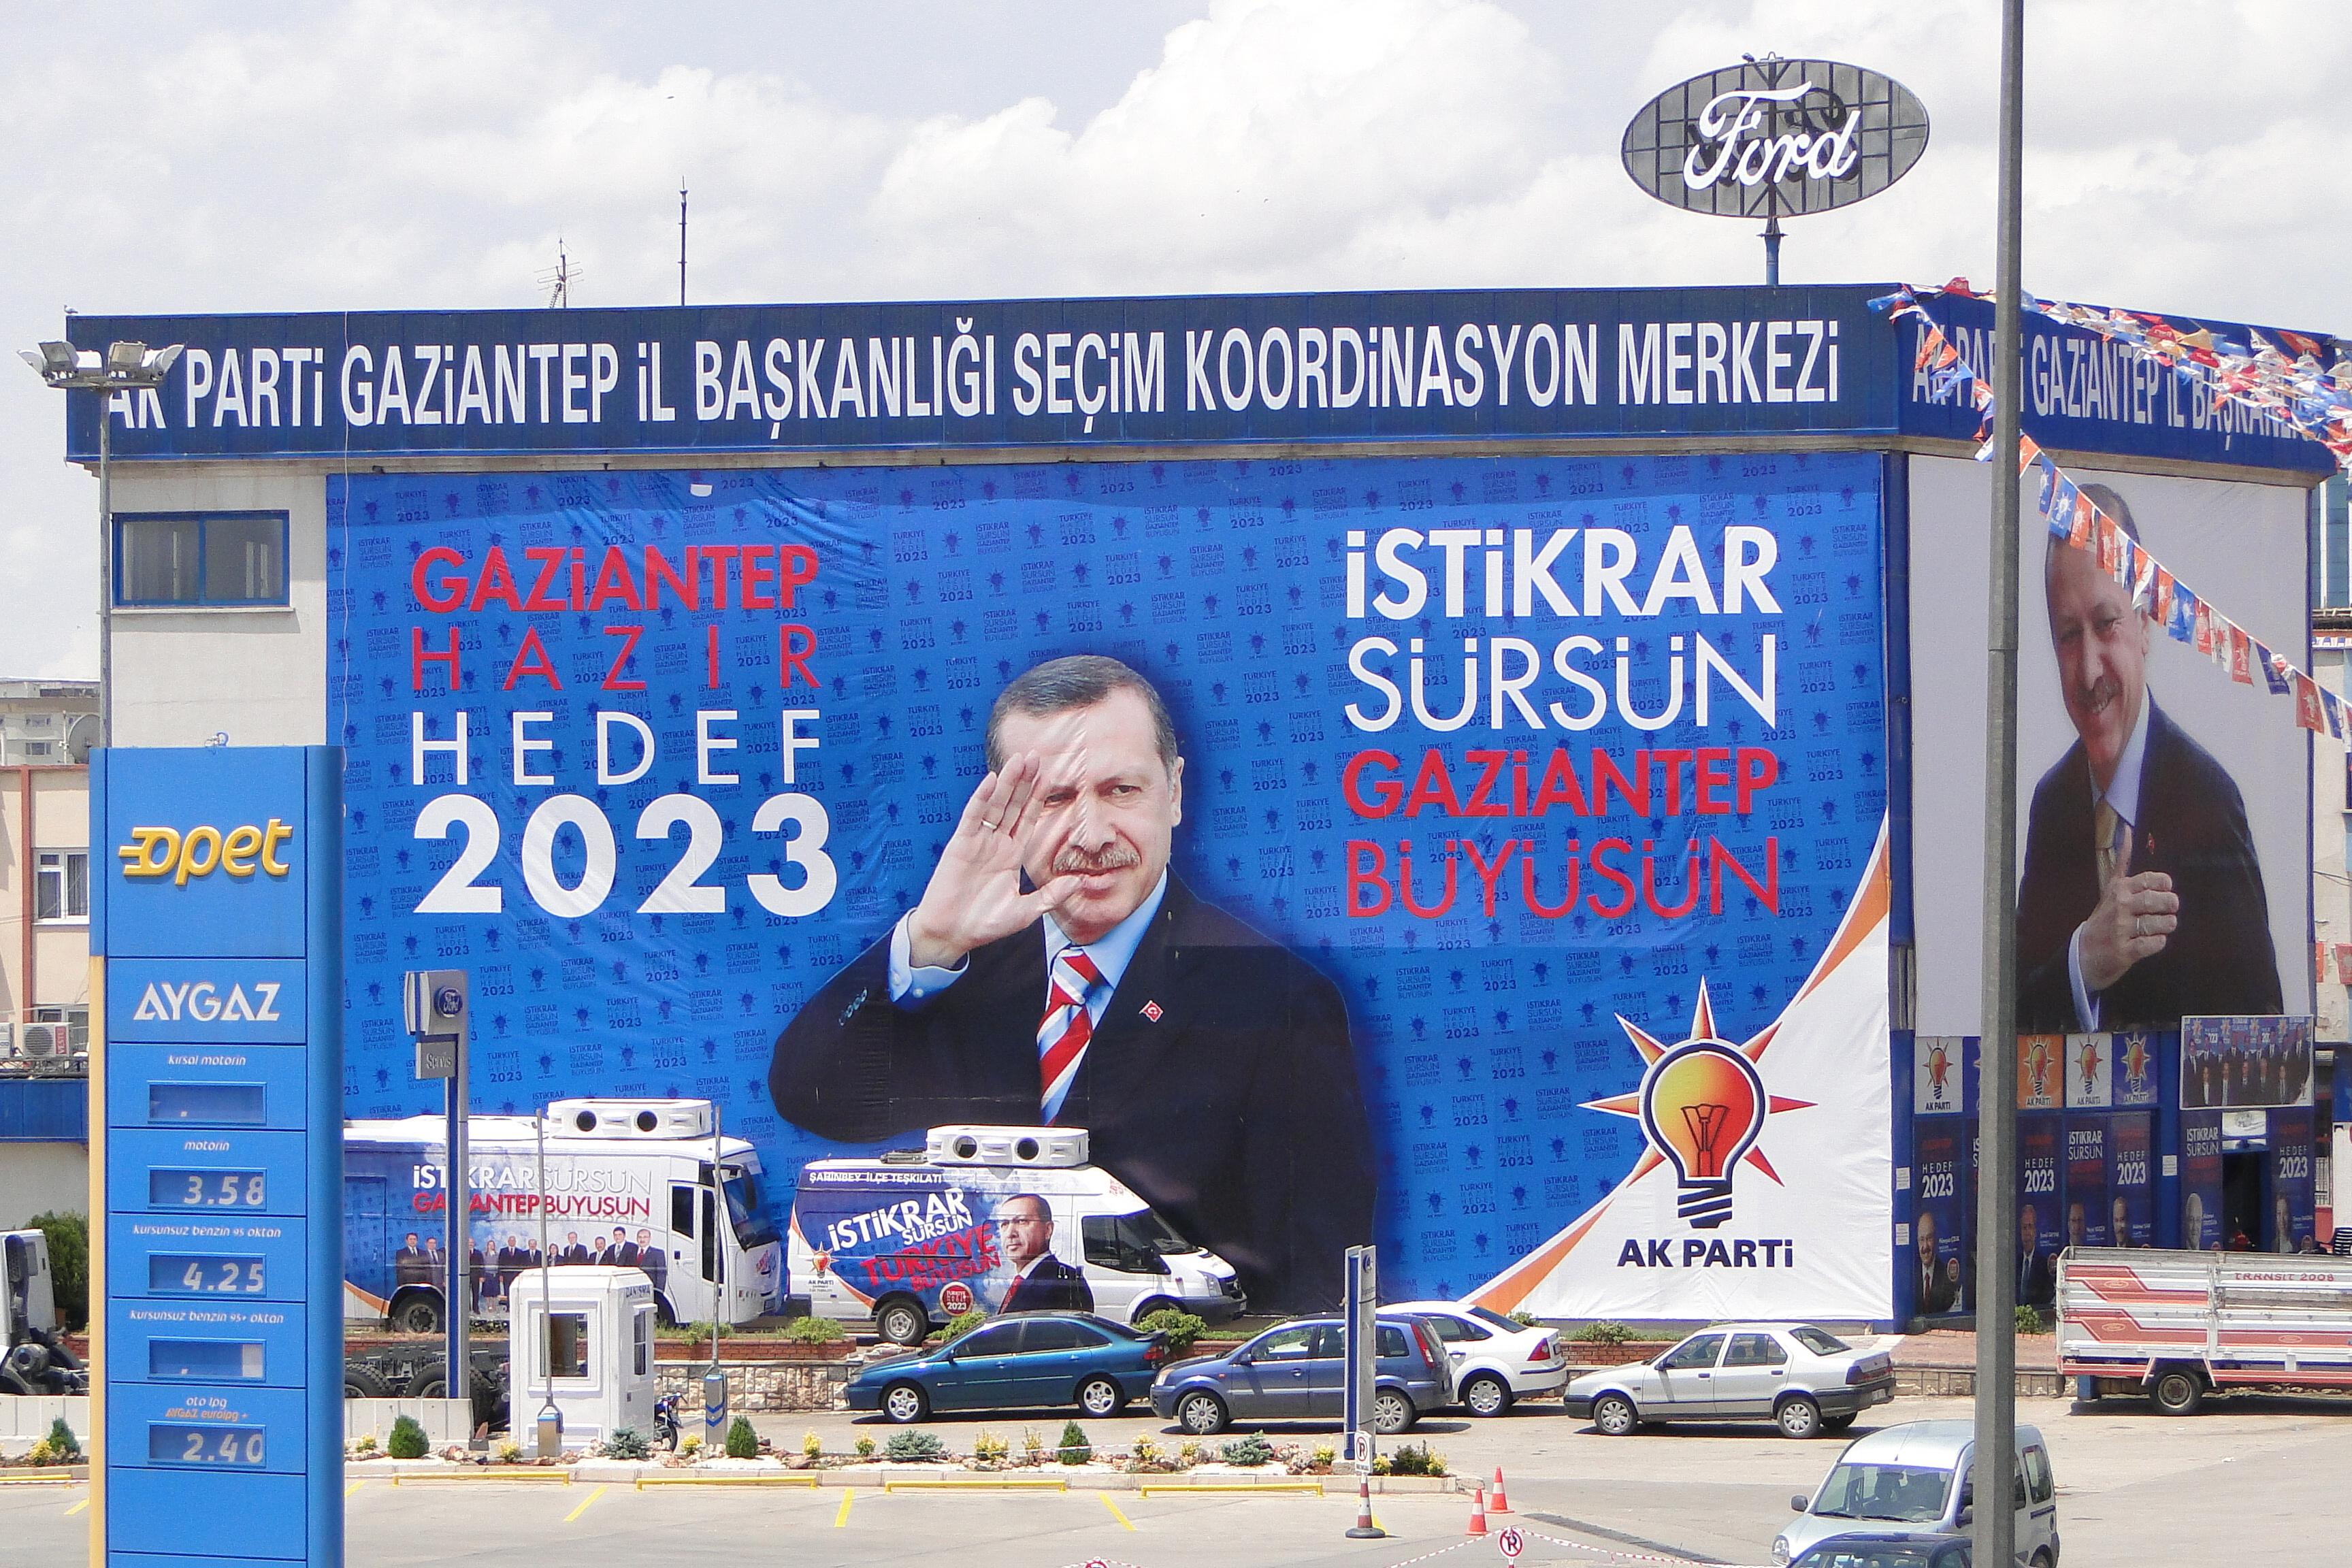 Manifesti elettorali per Recep Tayyip Erdoğan (foto Andam Jones)